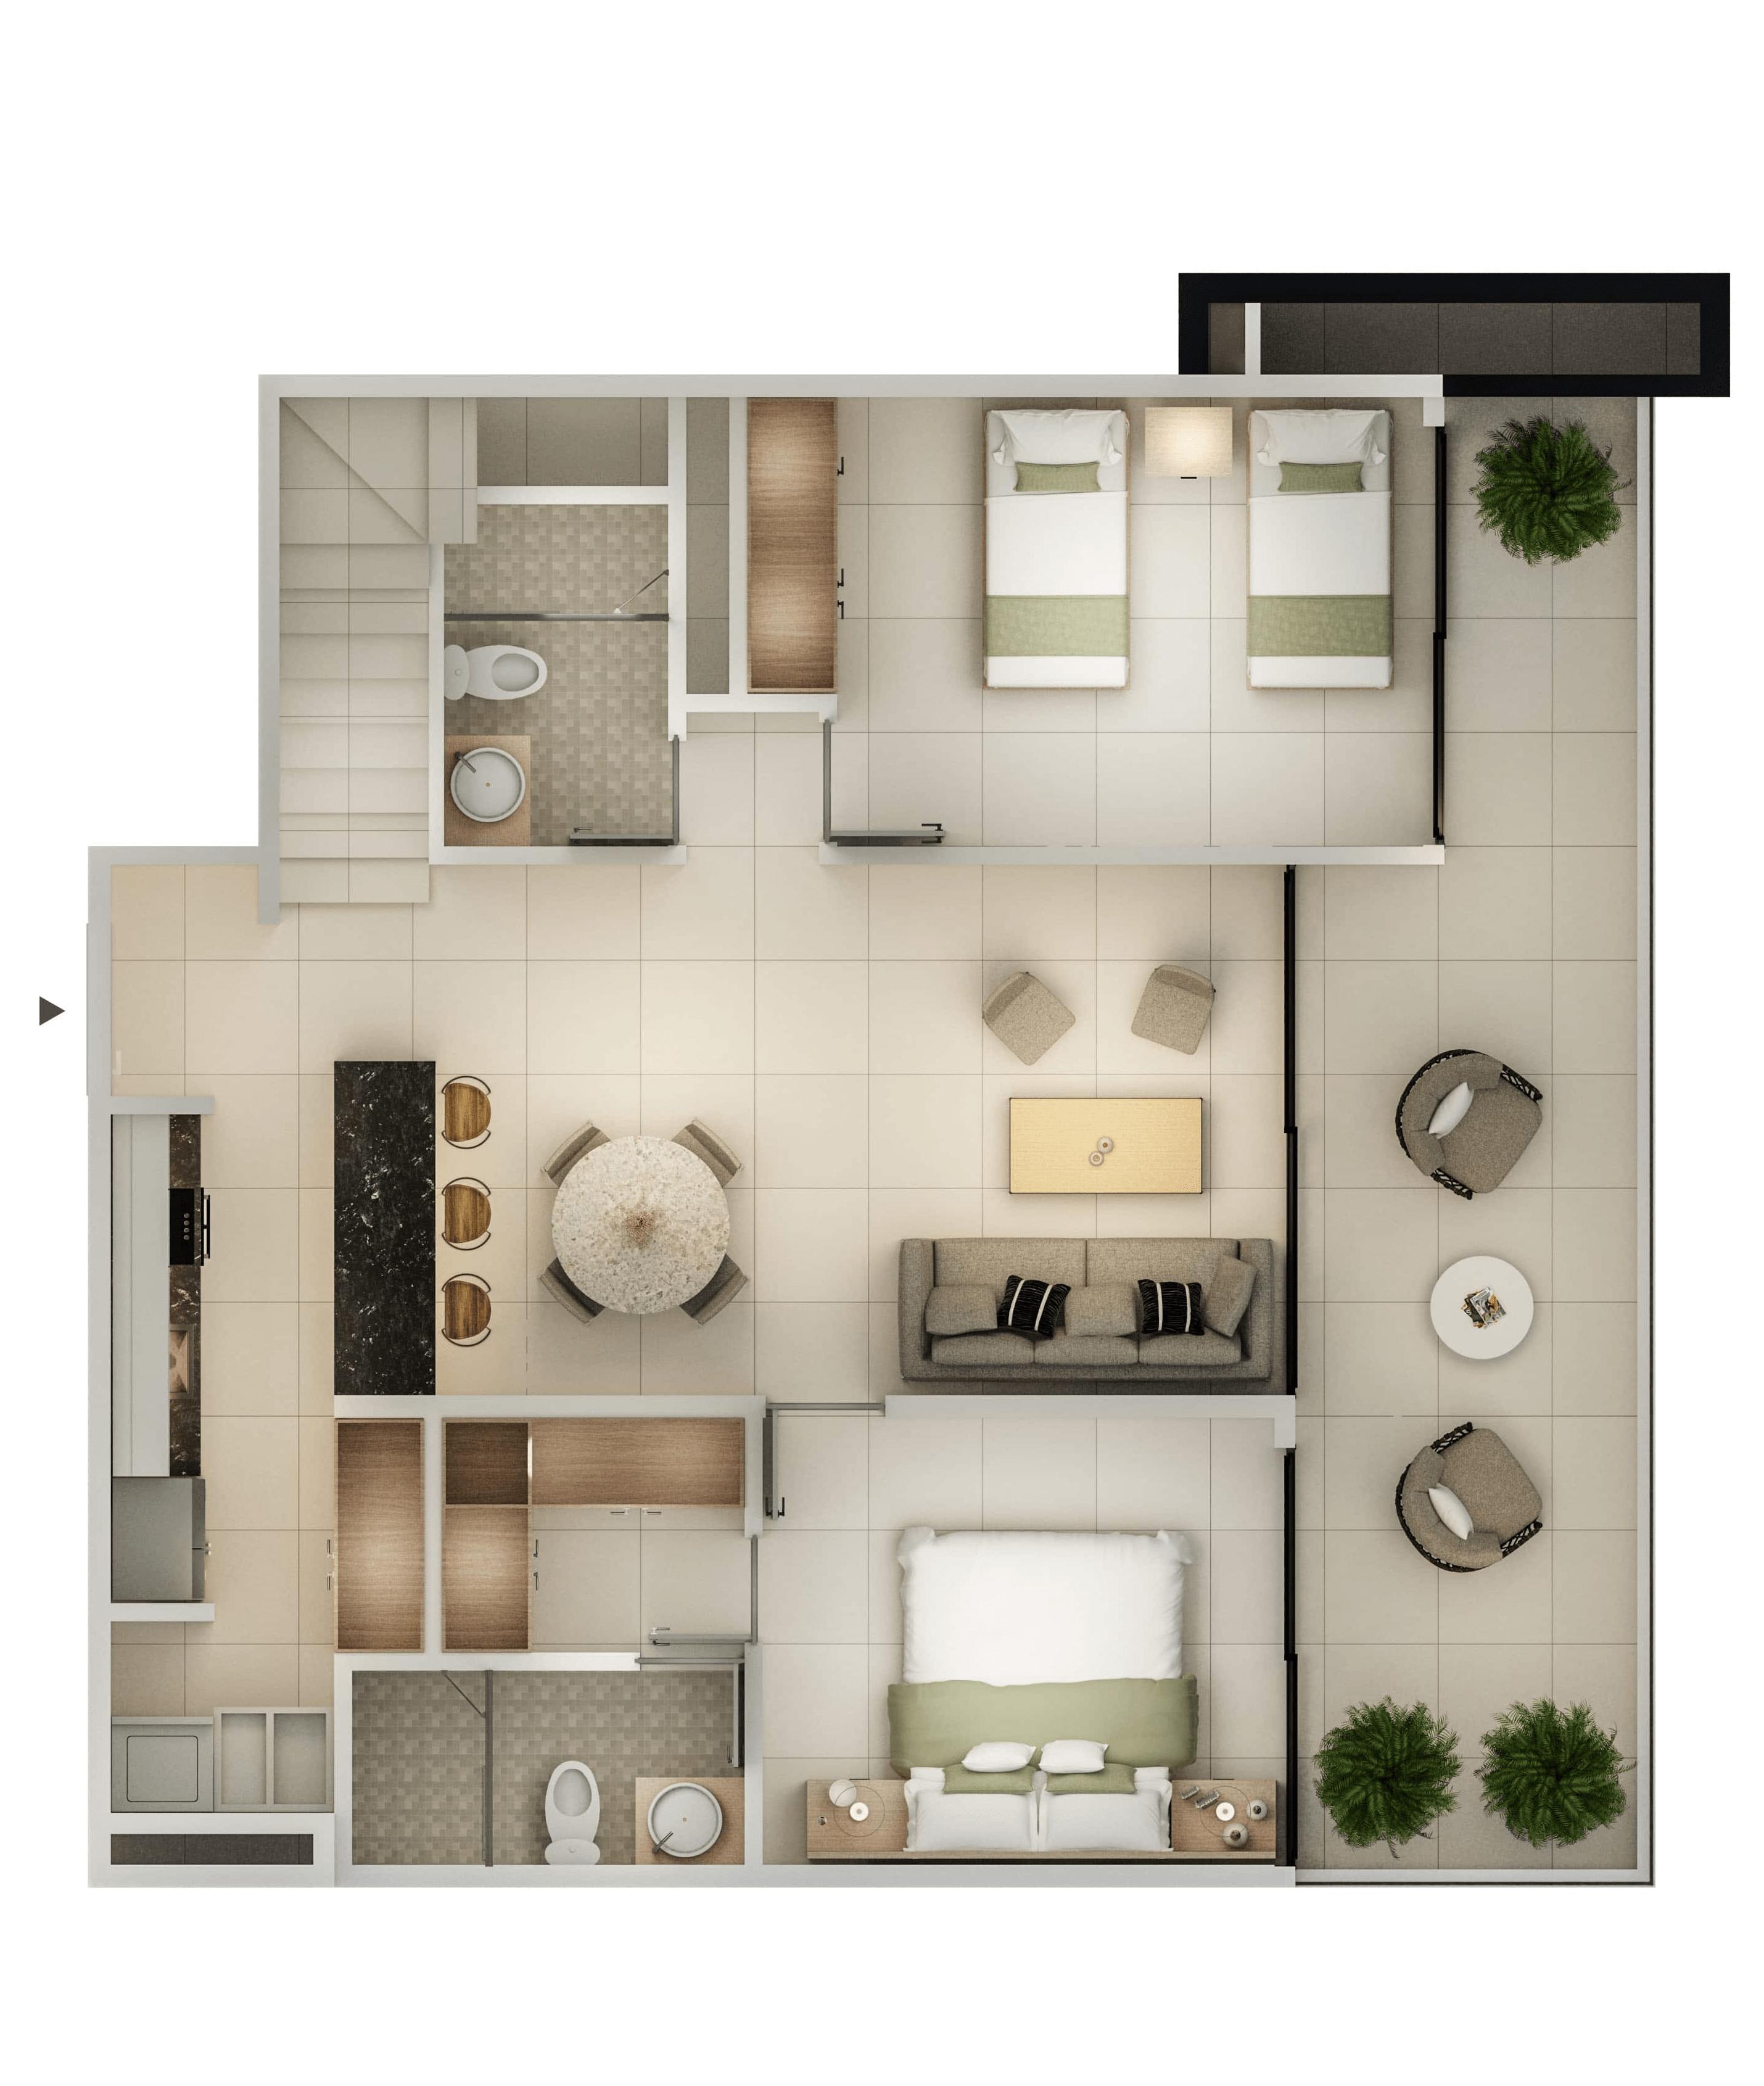 penthouse_4_alcobas_planta_0-min